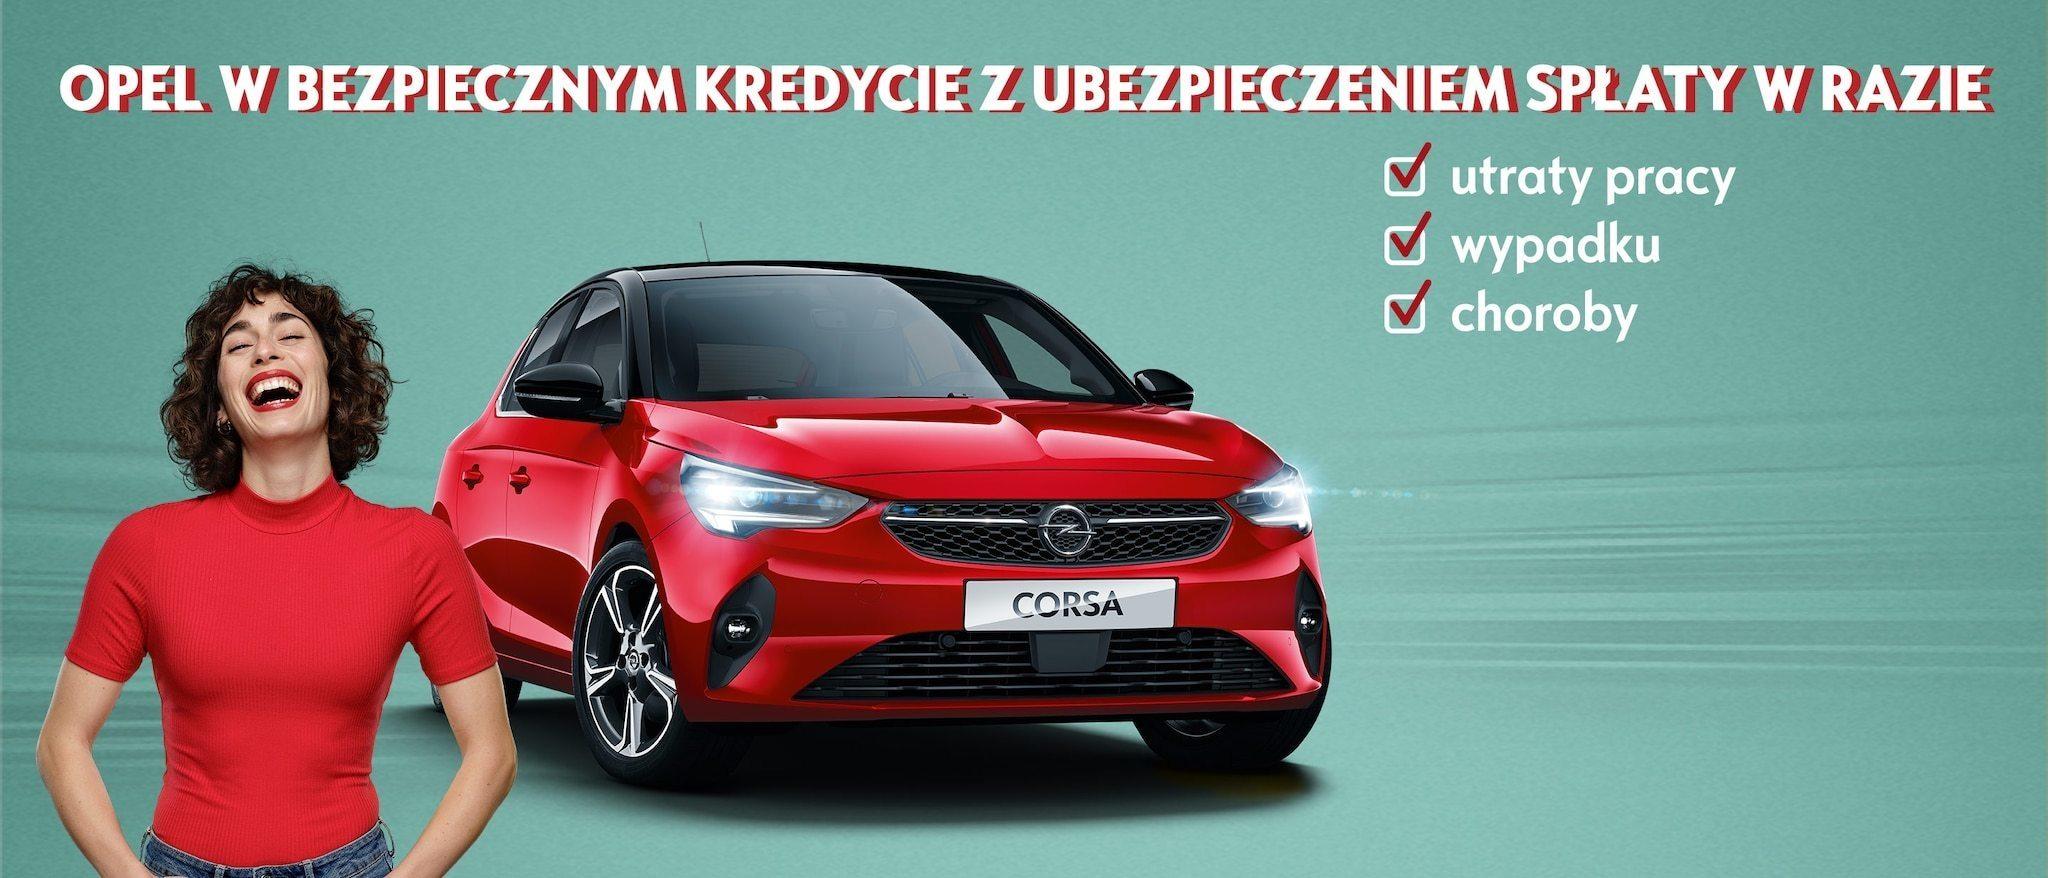 Opel Corsa już od 499 zł/mies.